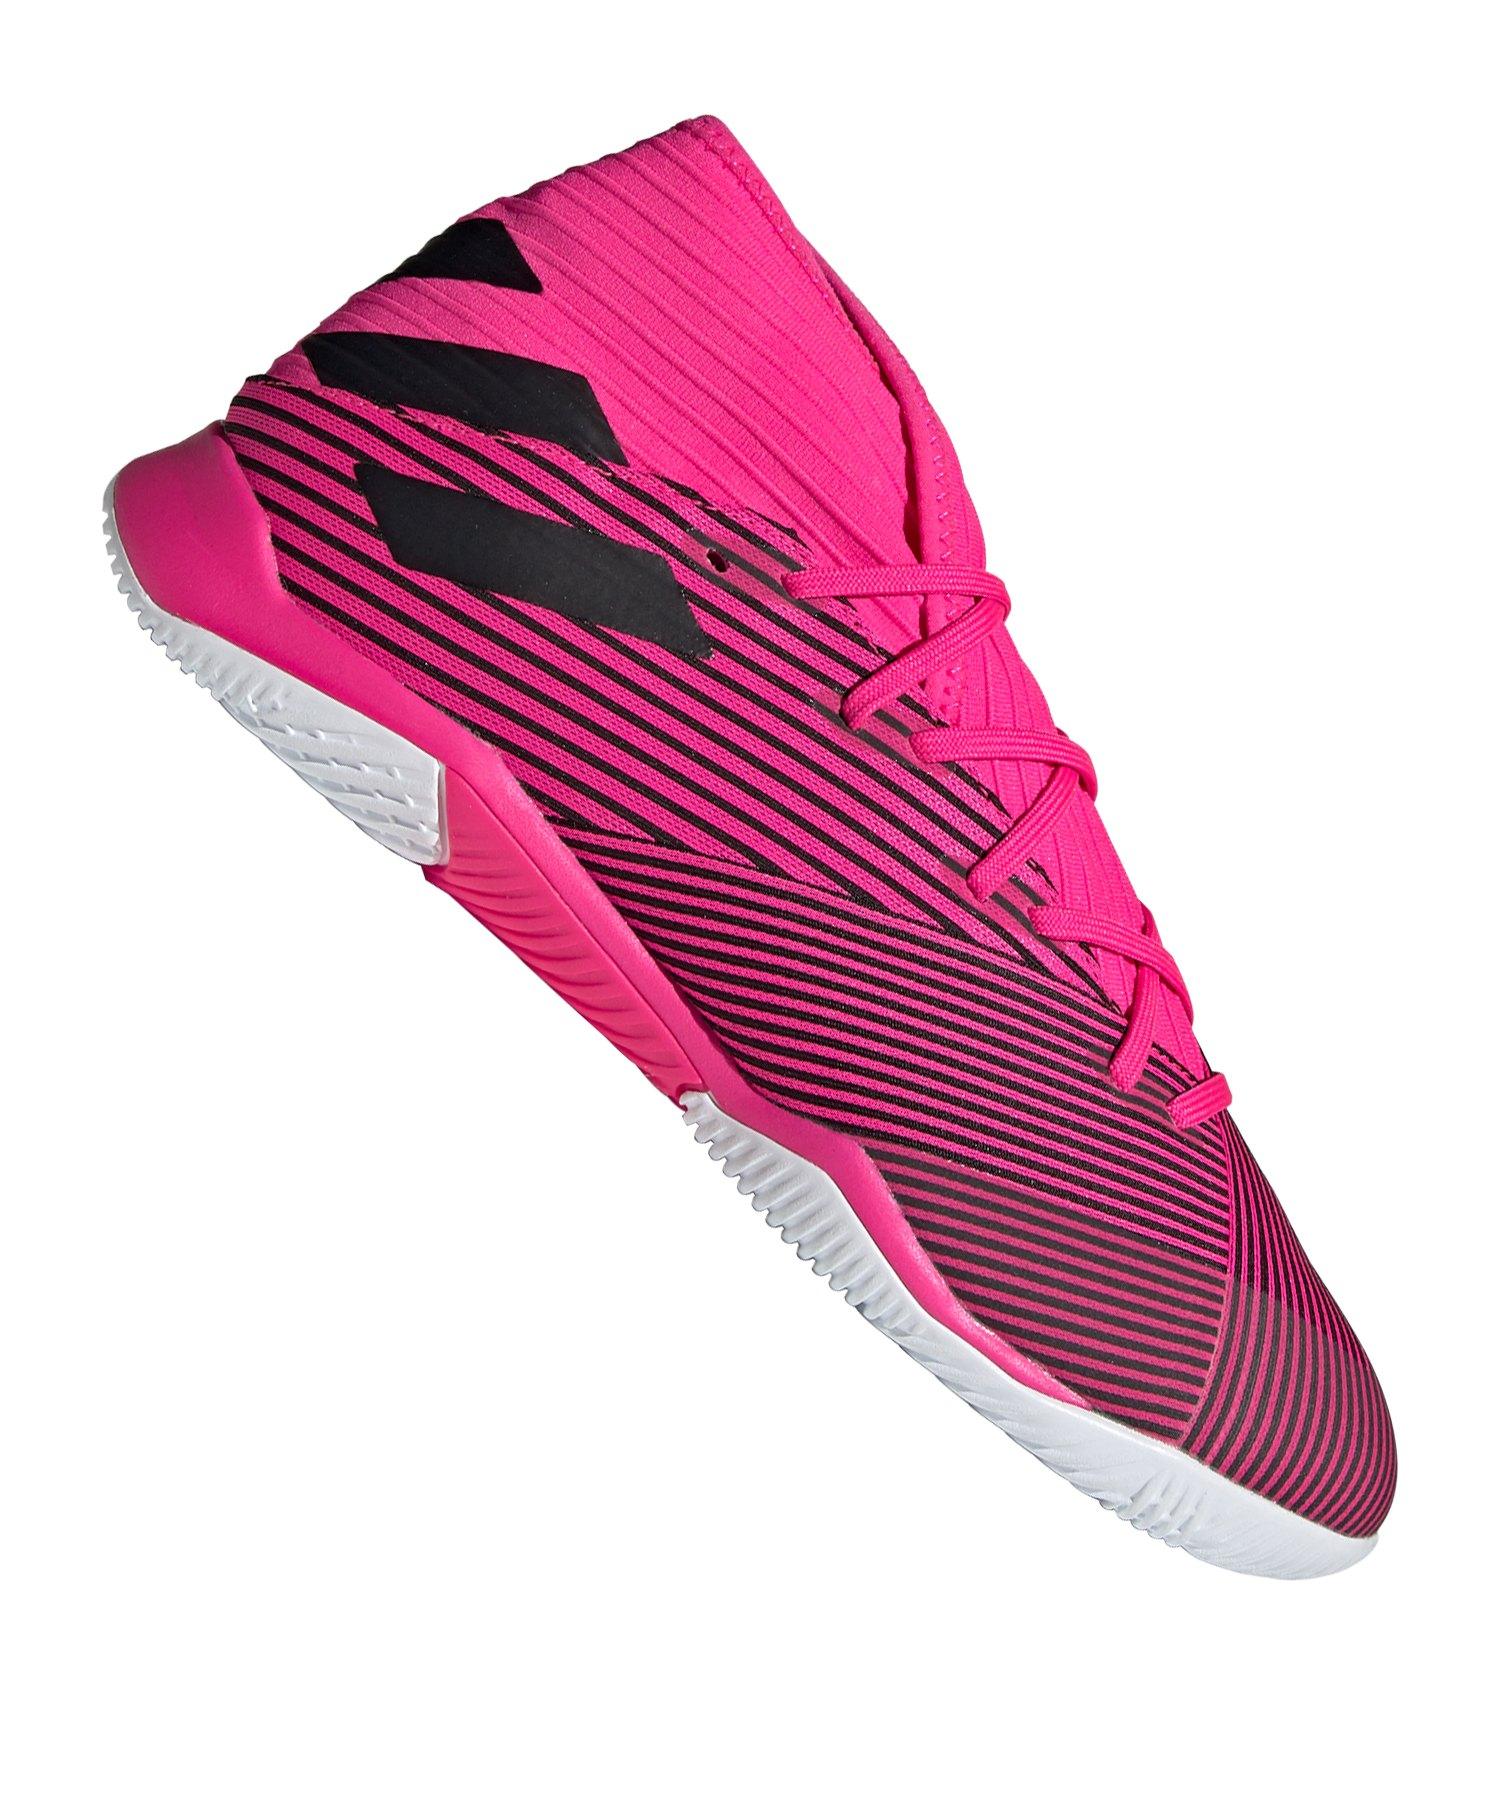 adidas NEMEZIZ 19.3 IN Halle Pink - pink